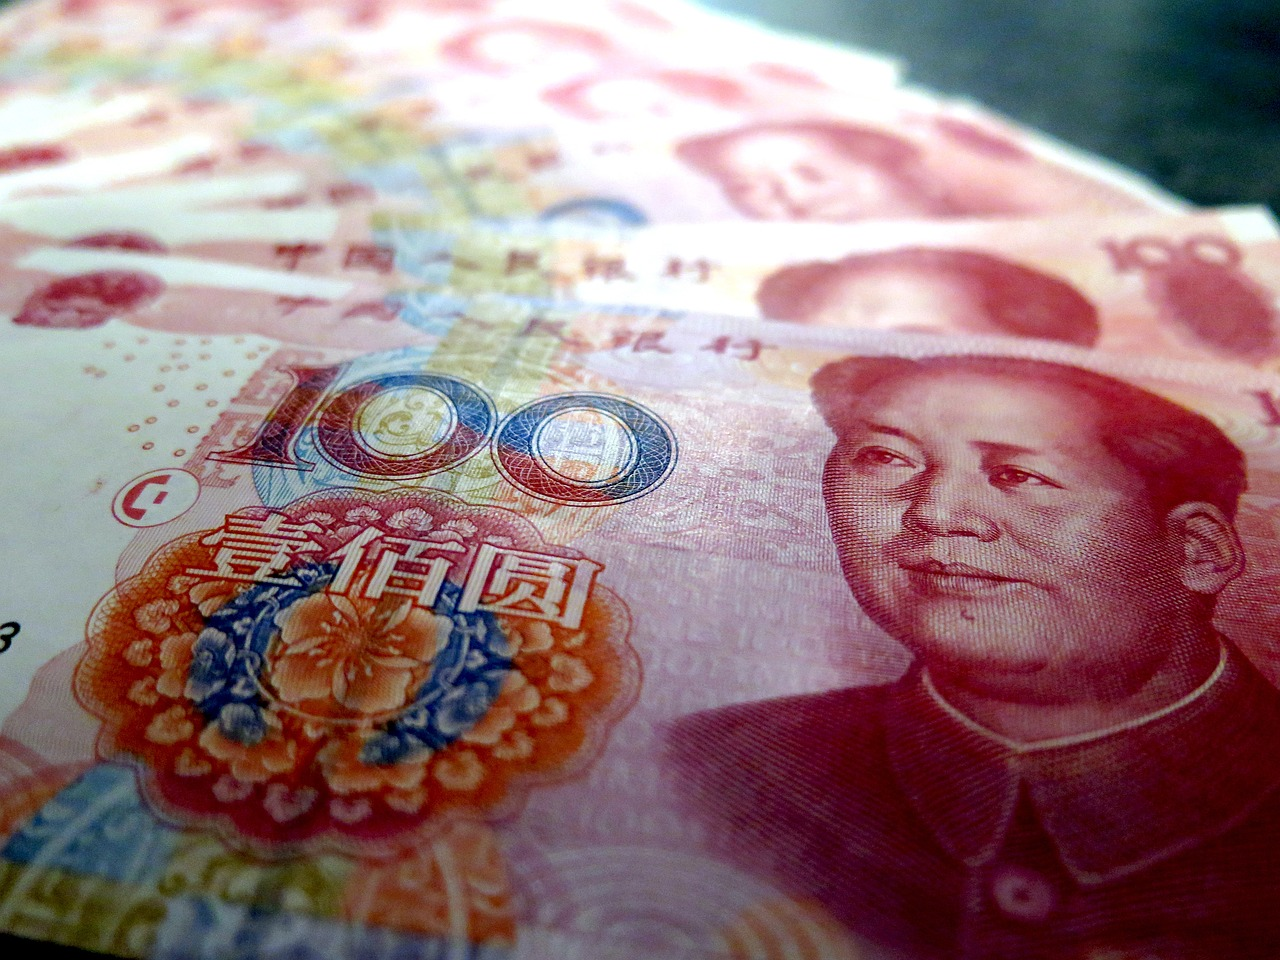 China fines Alibaba $2.75 billion in nation's largest antitrust penalty